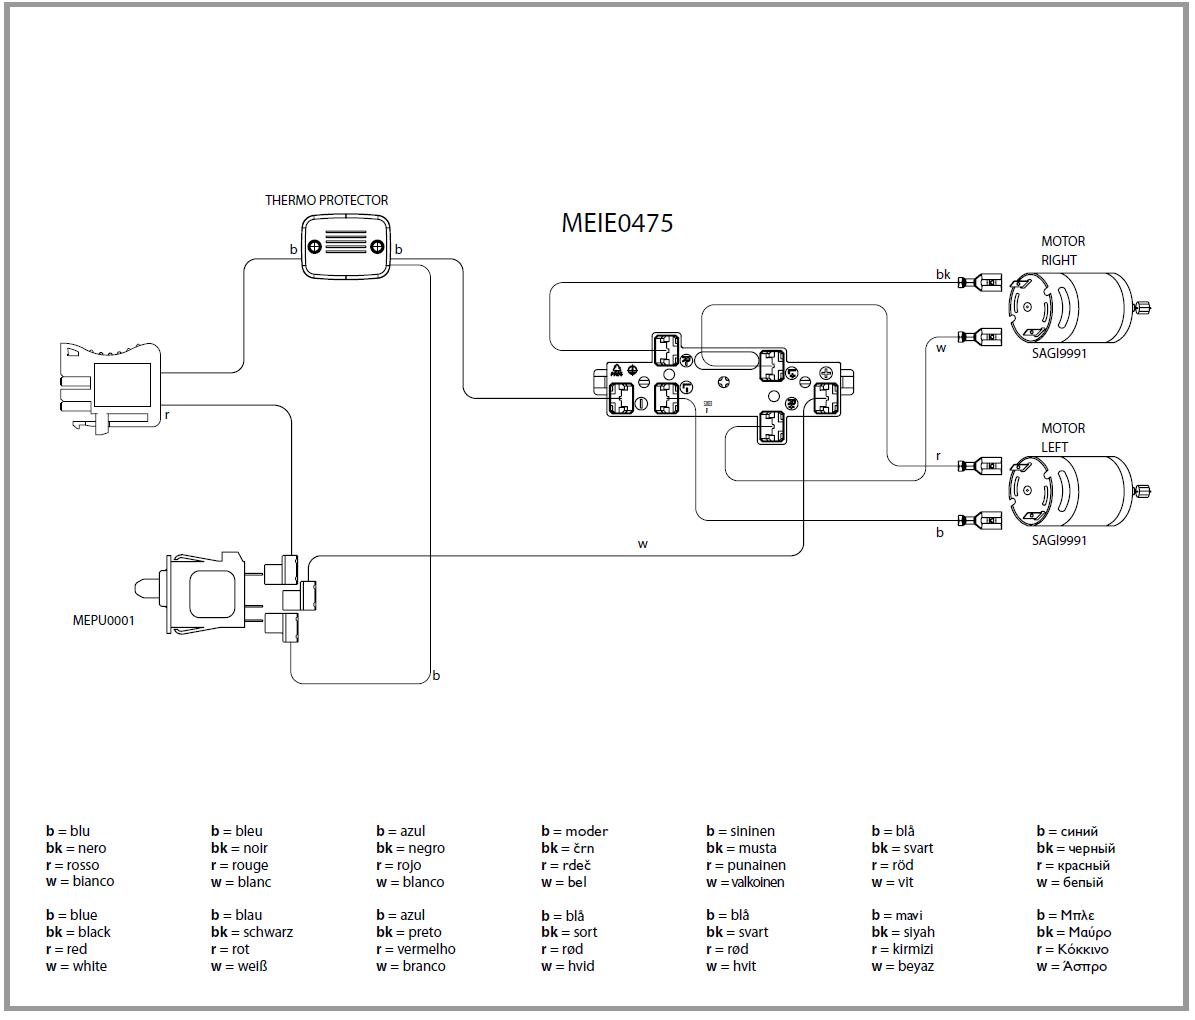 8n 12v wiring diagram peg perego 12v wiring diagram john deere gator (revised) igod0004 igod0033 parts ...